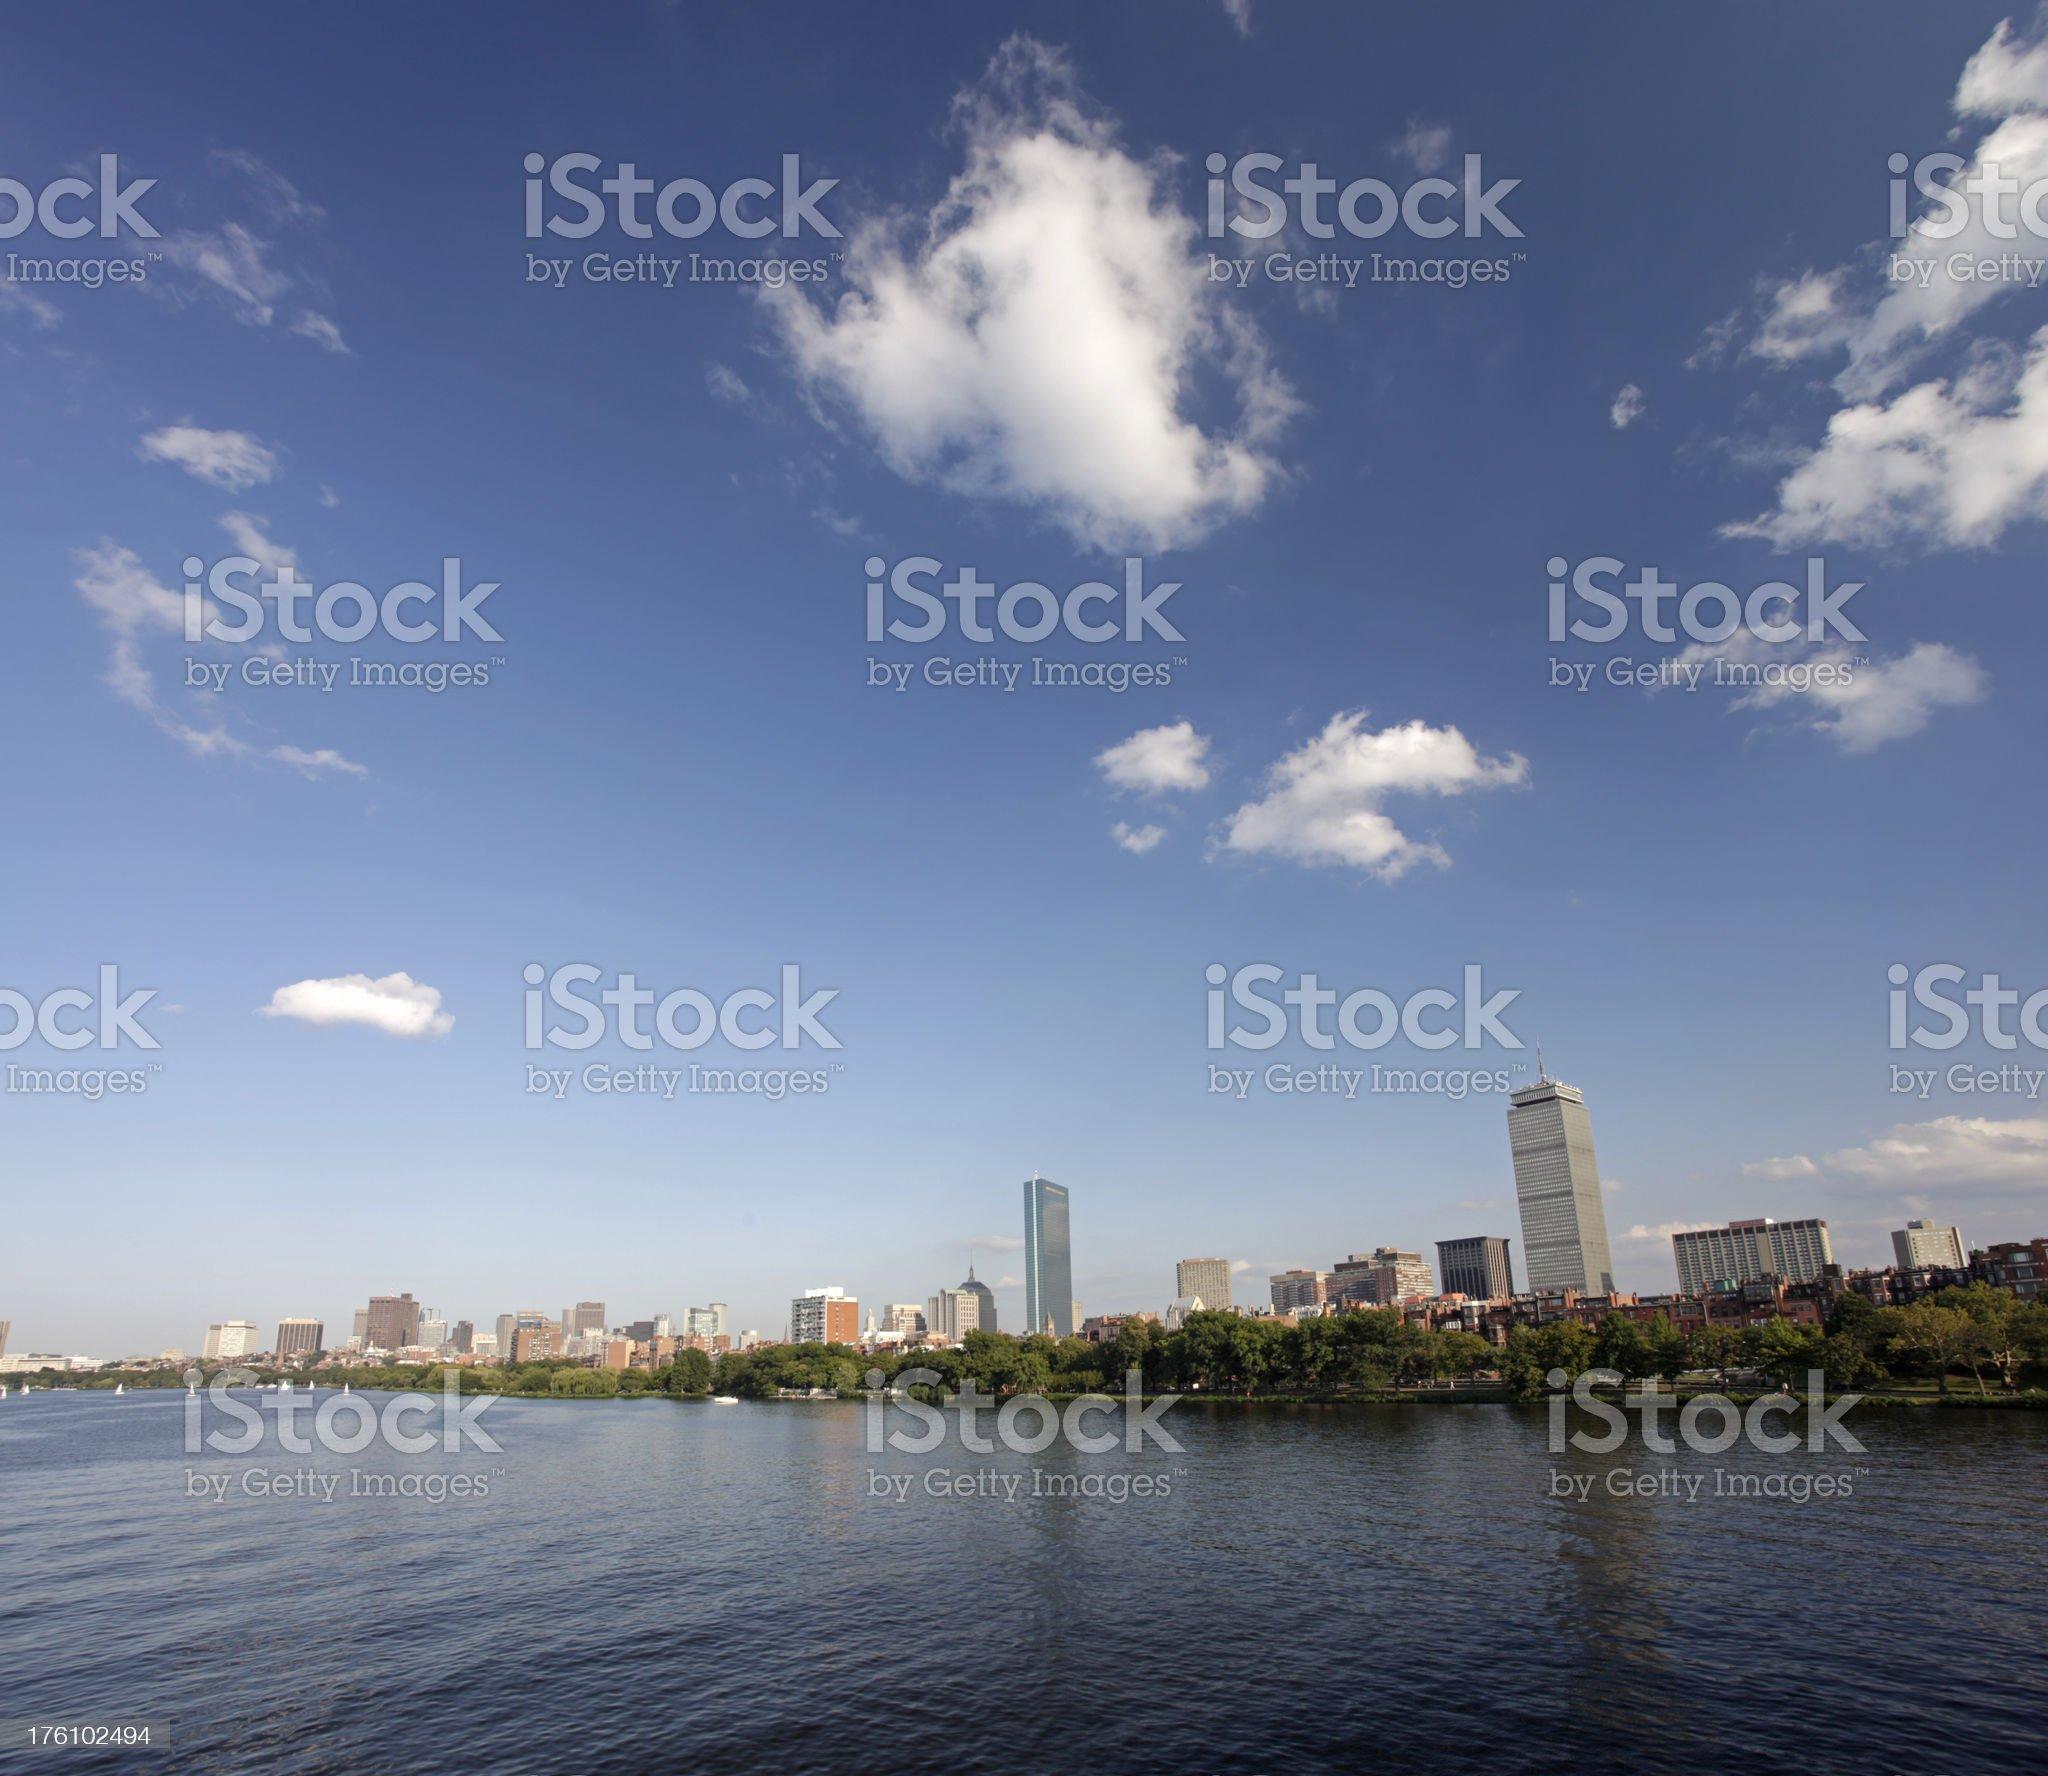 Boston Back Bay royalty-free stock photo